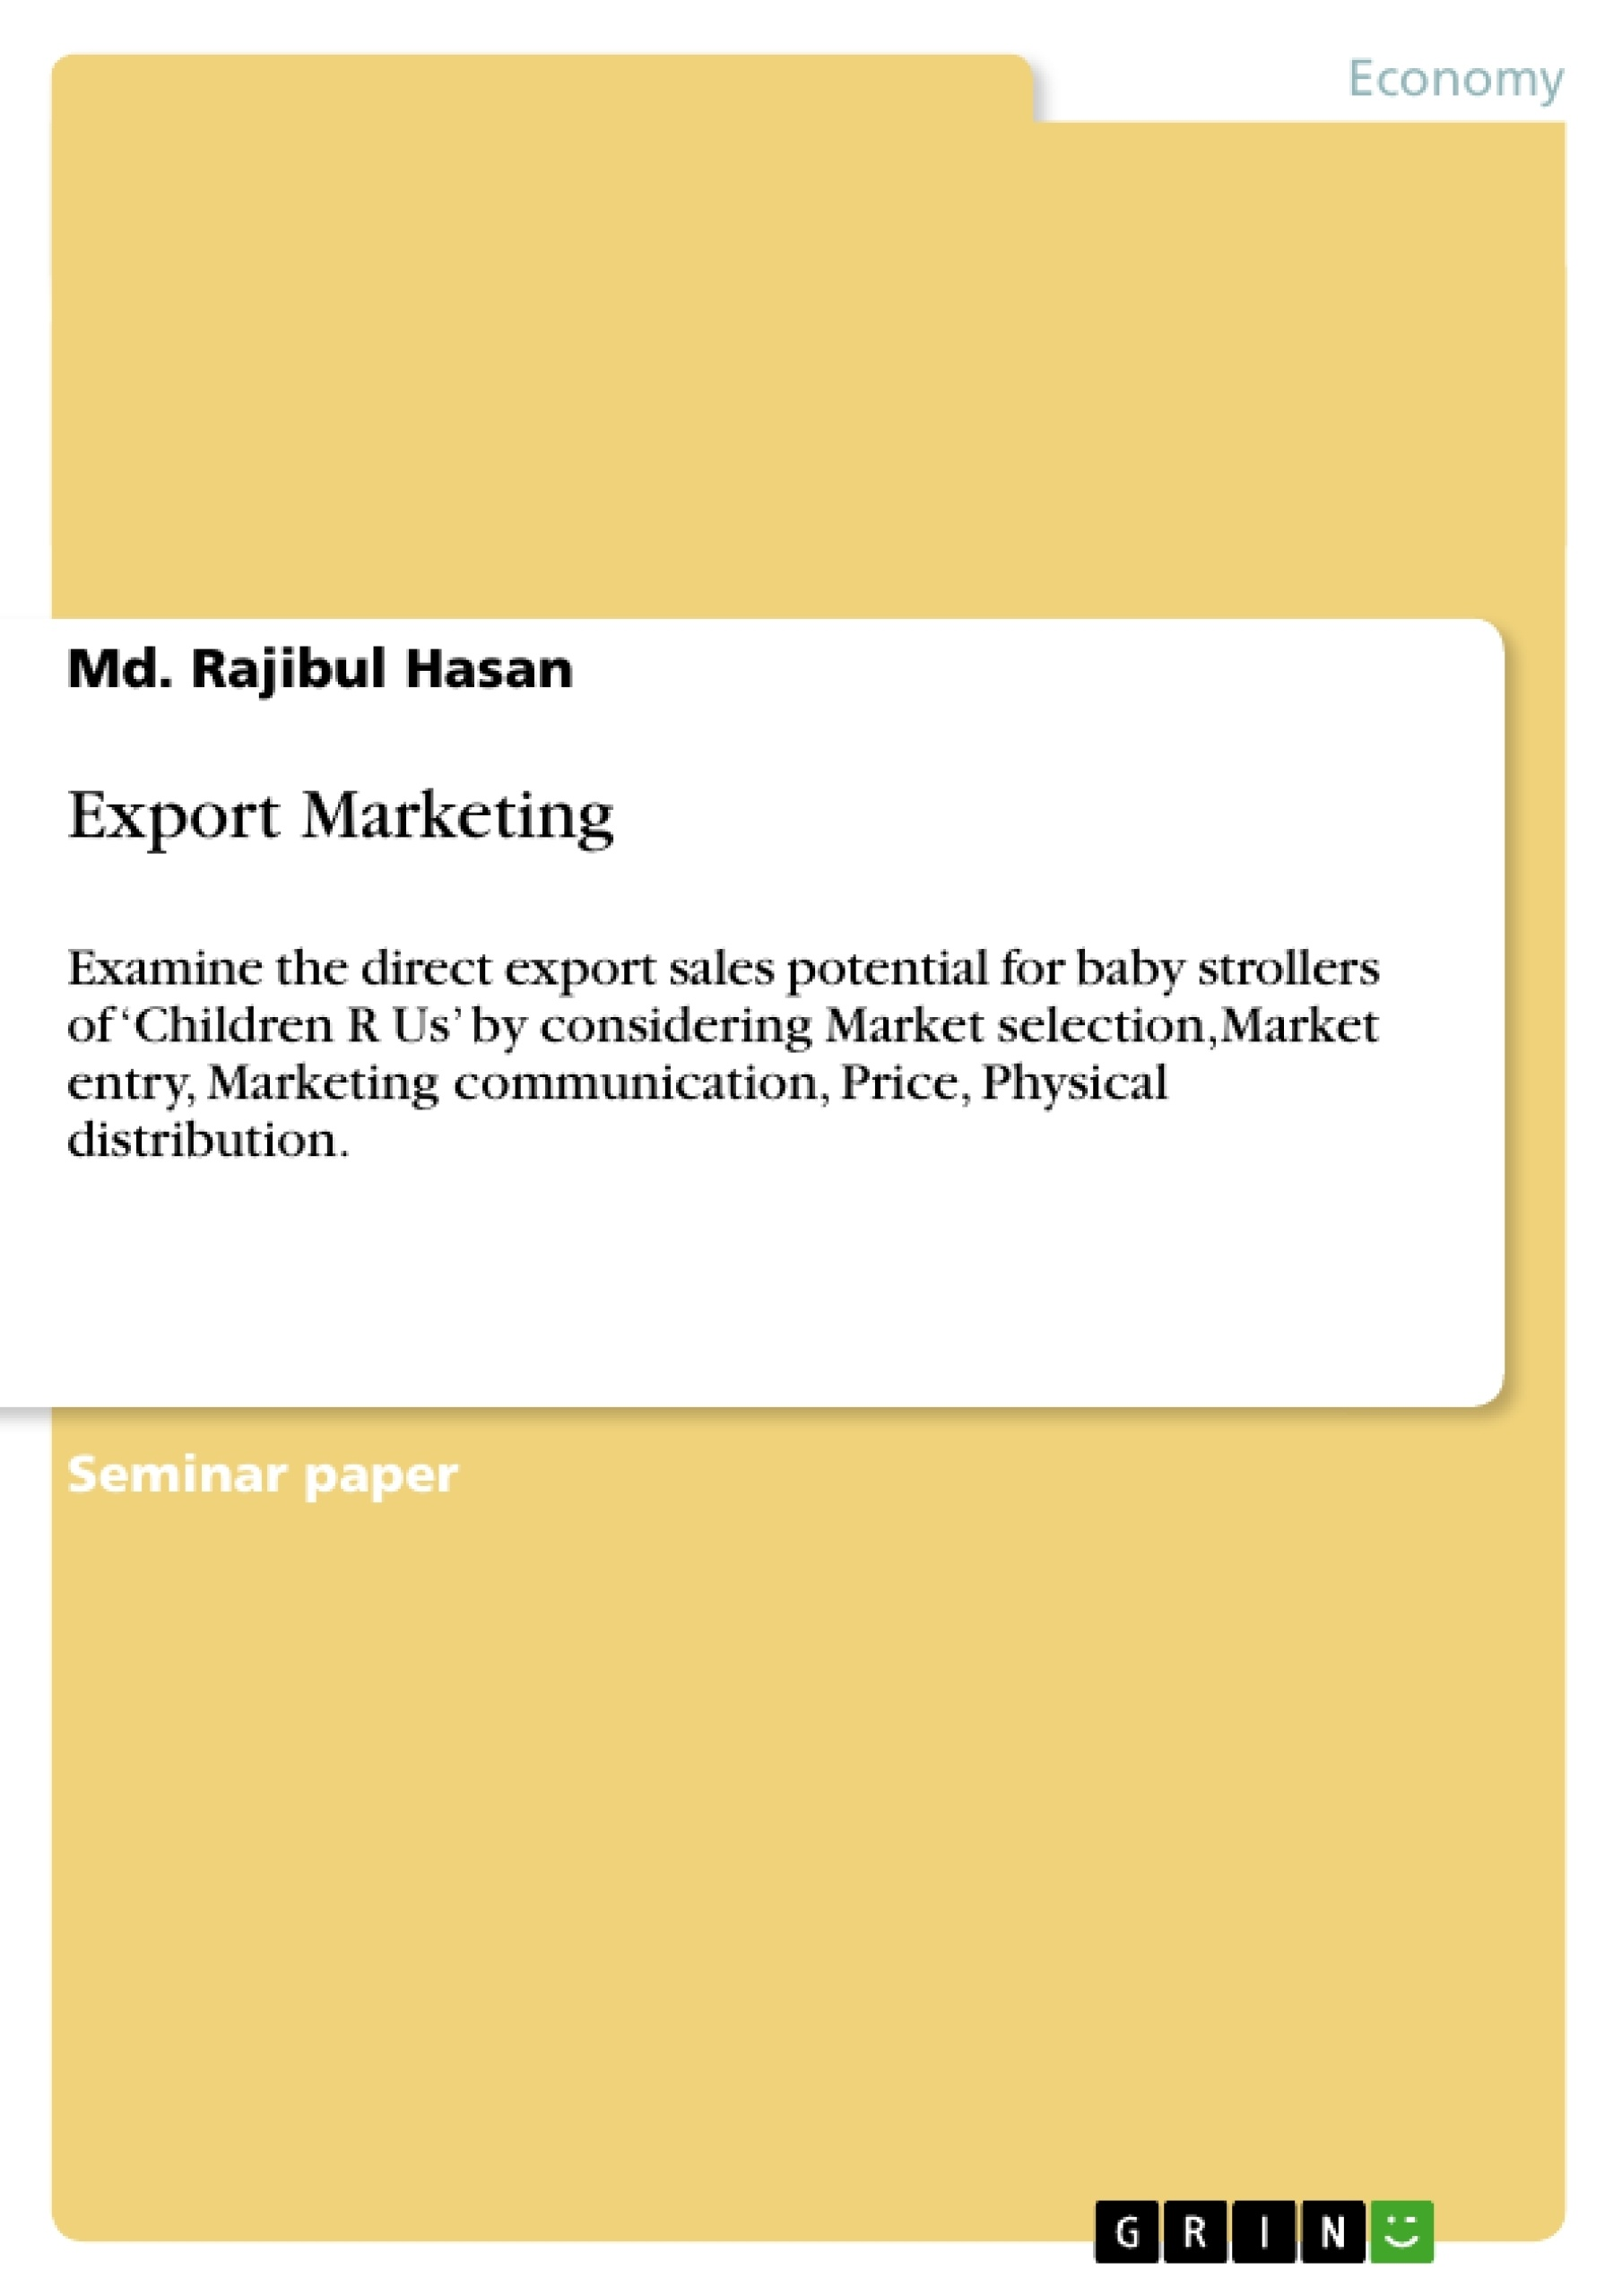 Title: Export Marketing